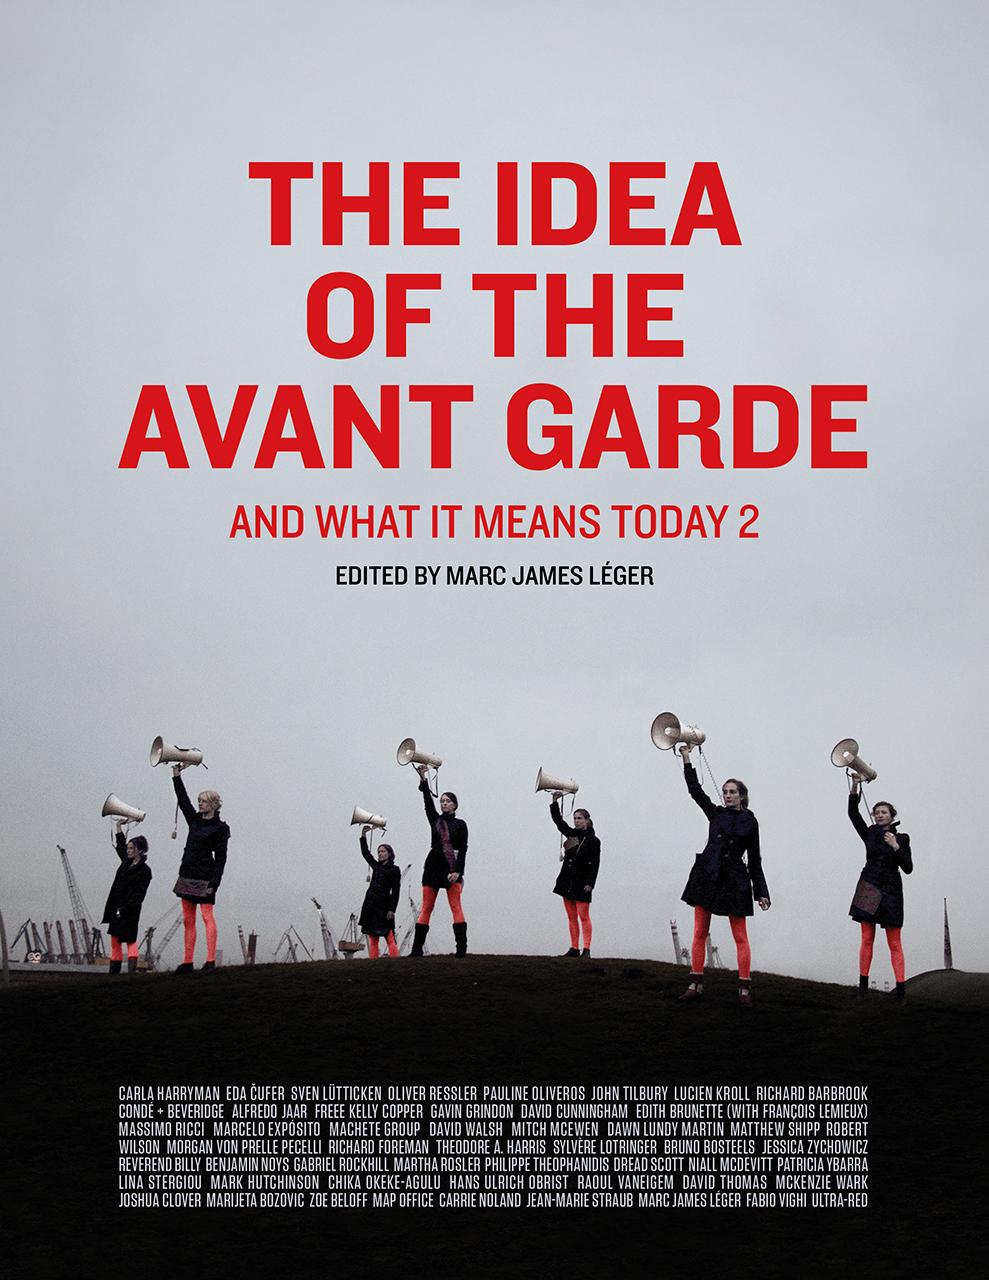 Idea of the Avant Garde